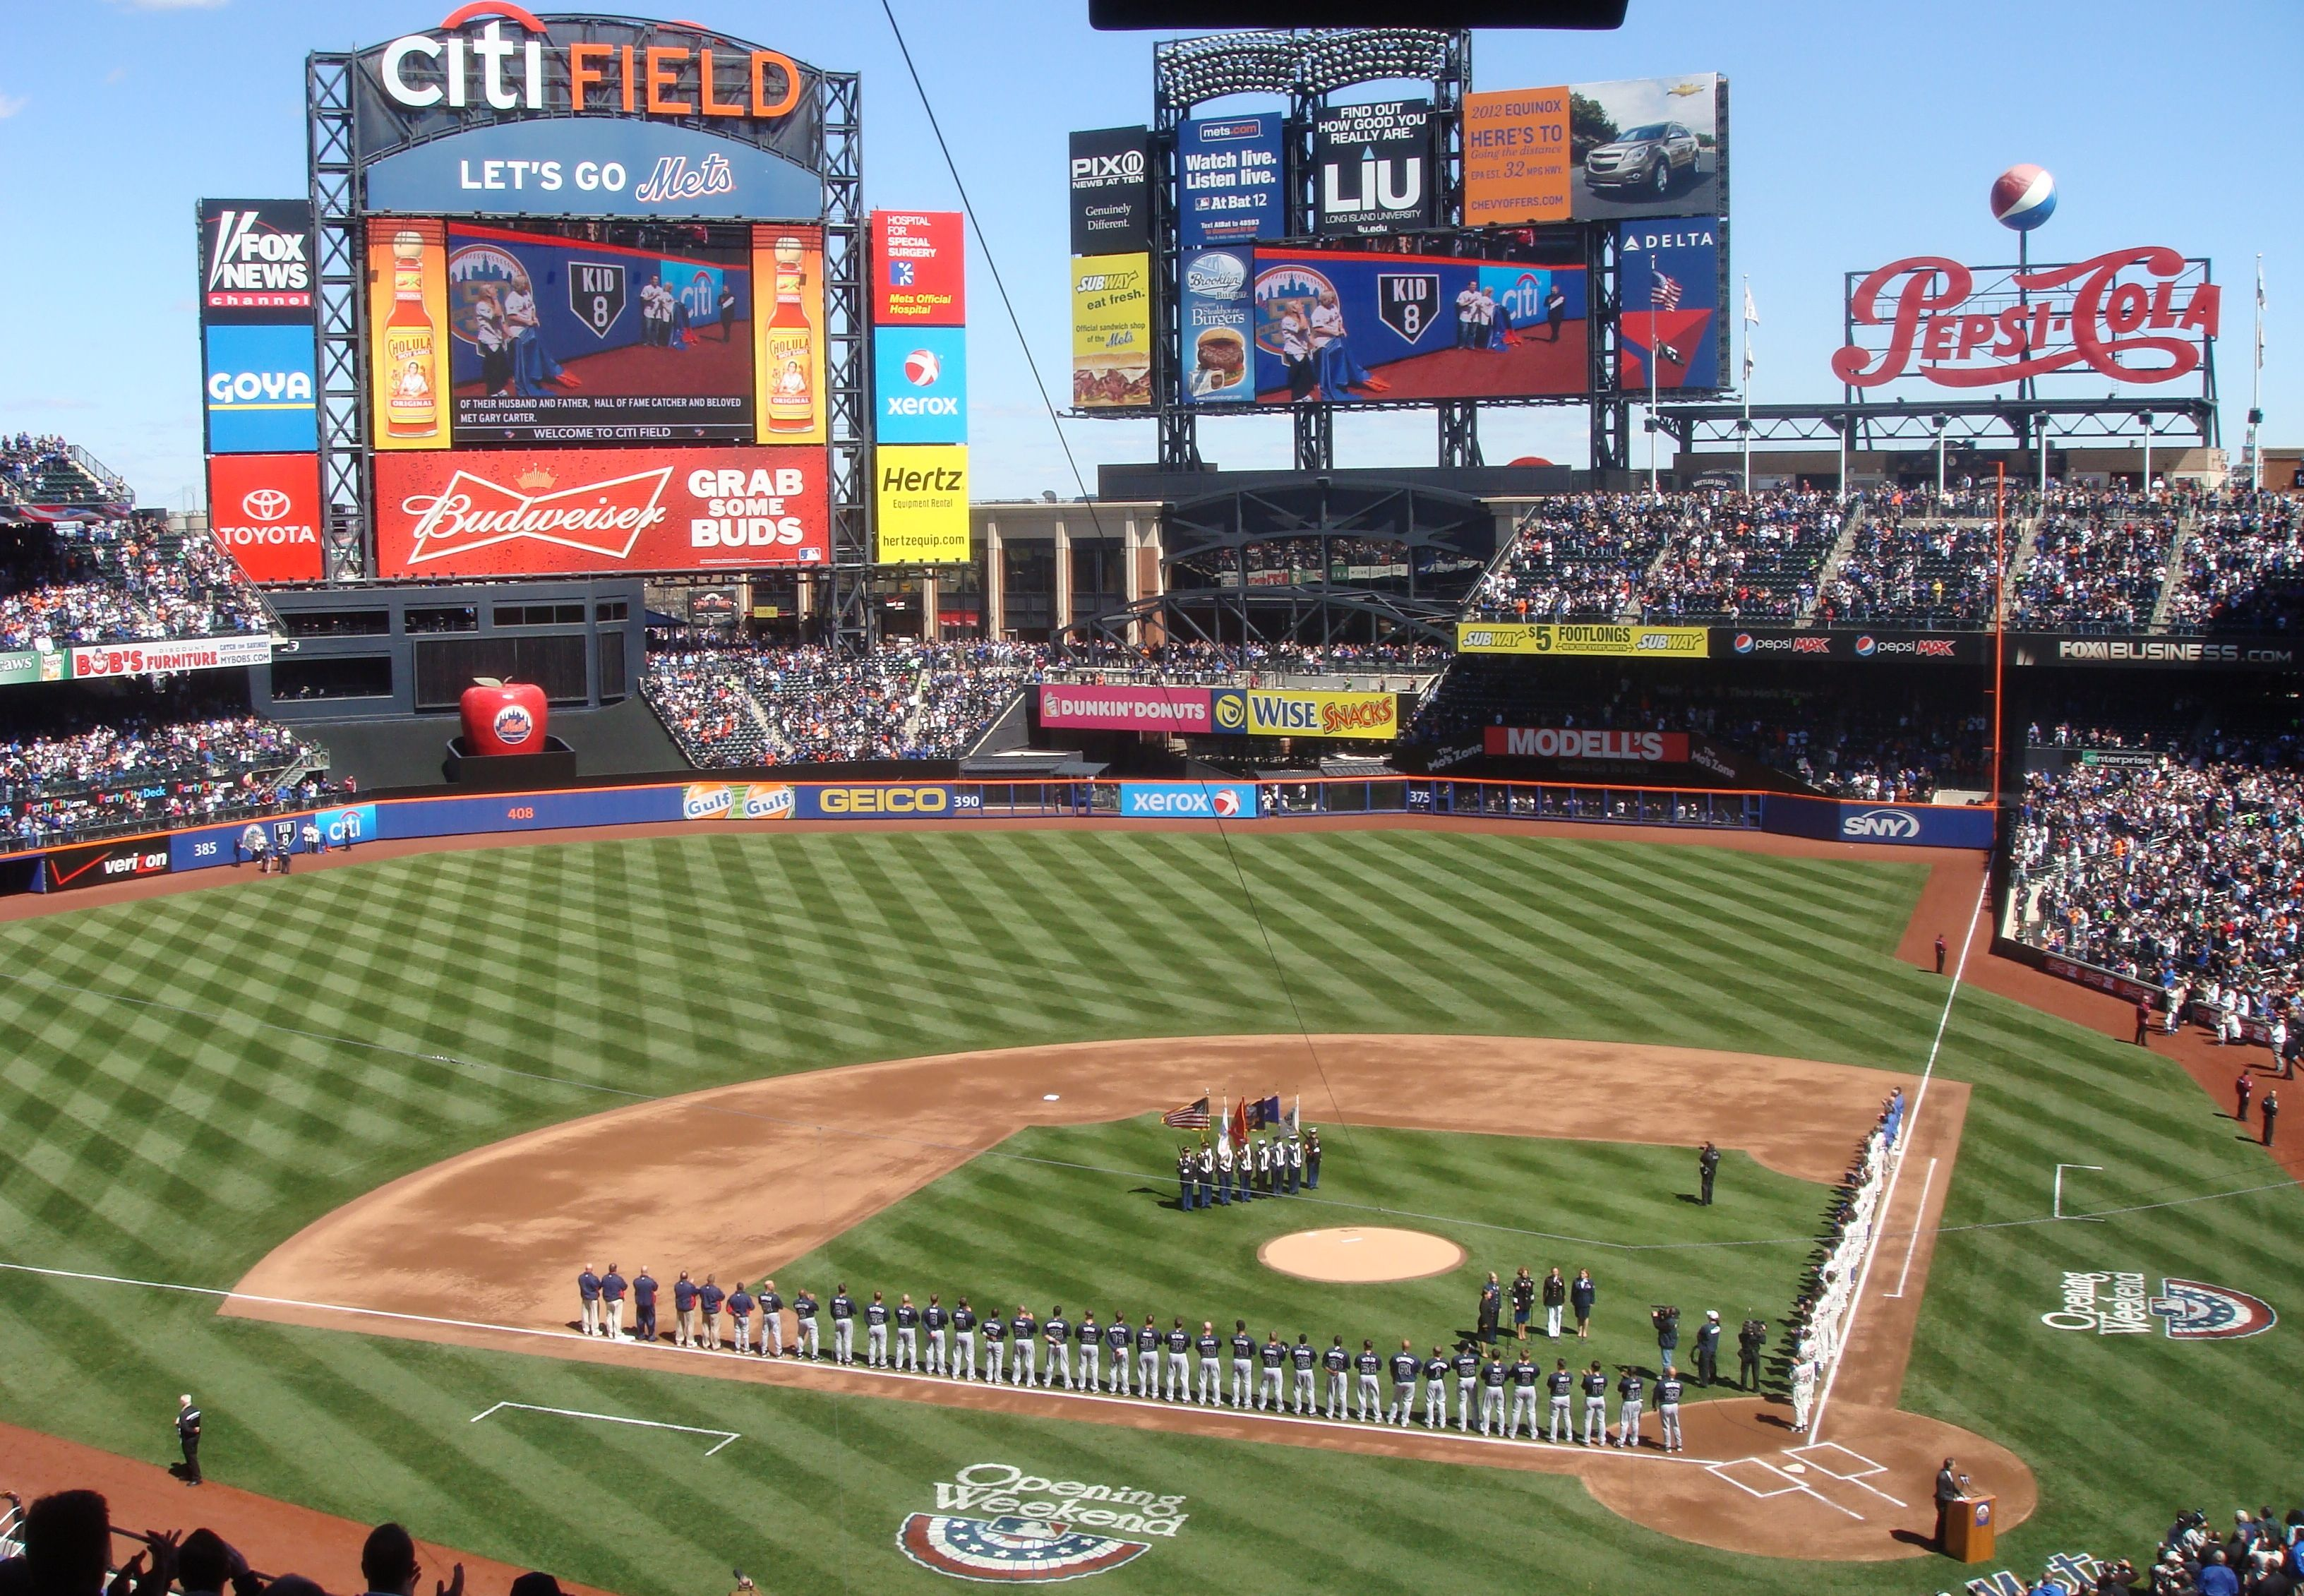 New York Mets Citi Field New York Mets Washington Nationals Field Wallpaper